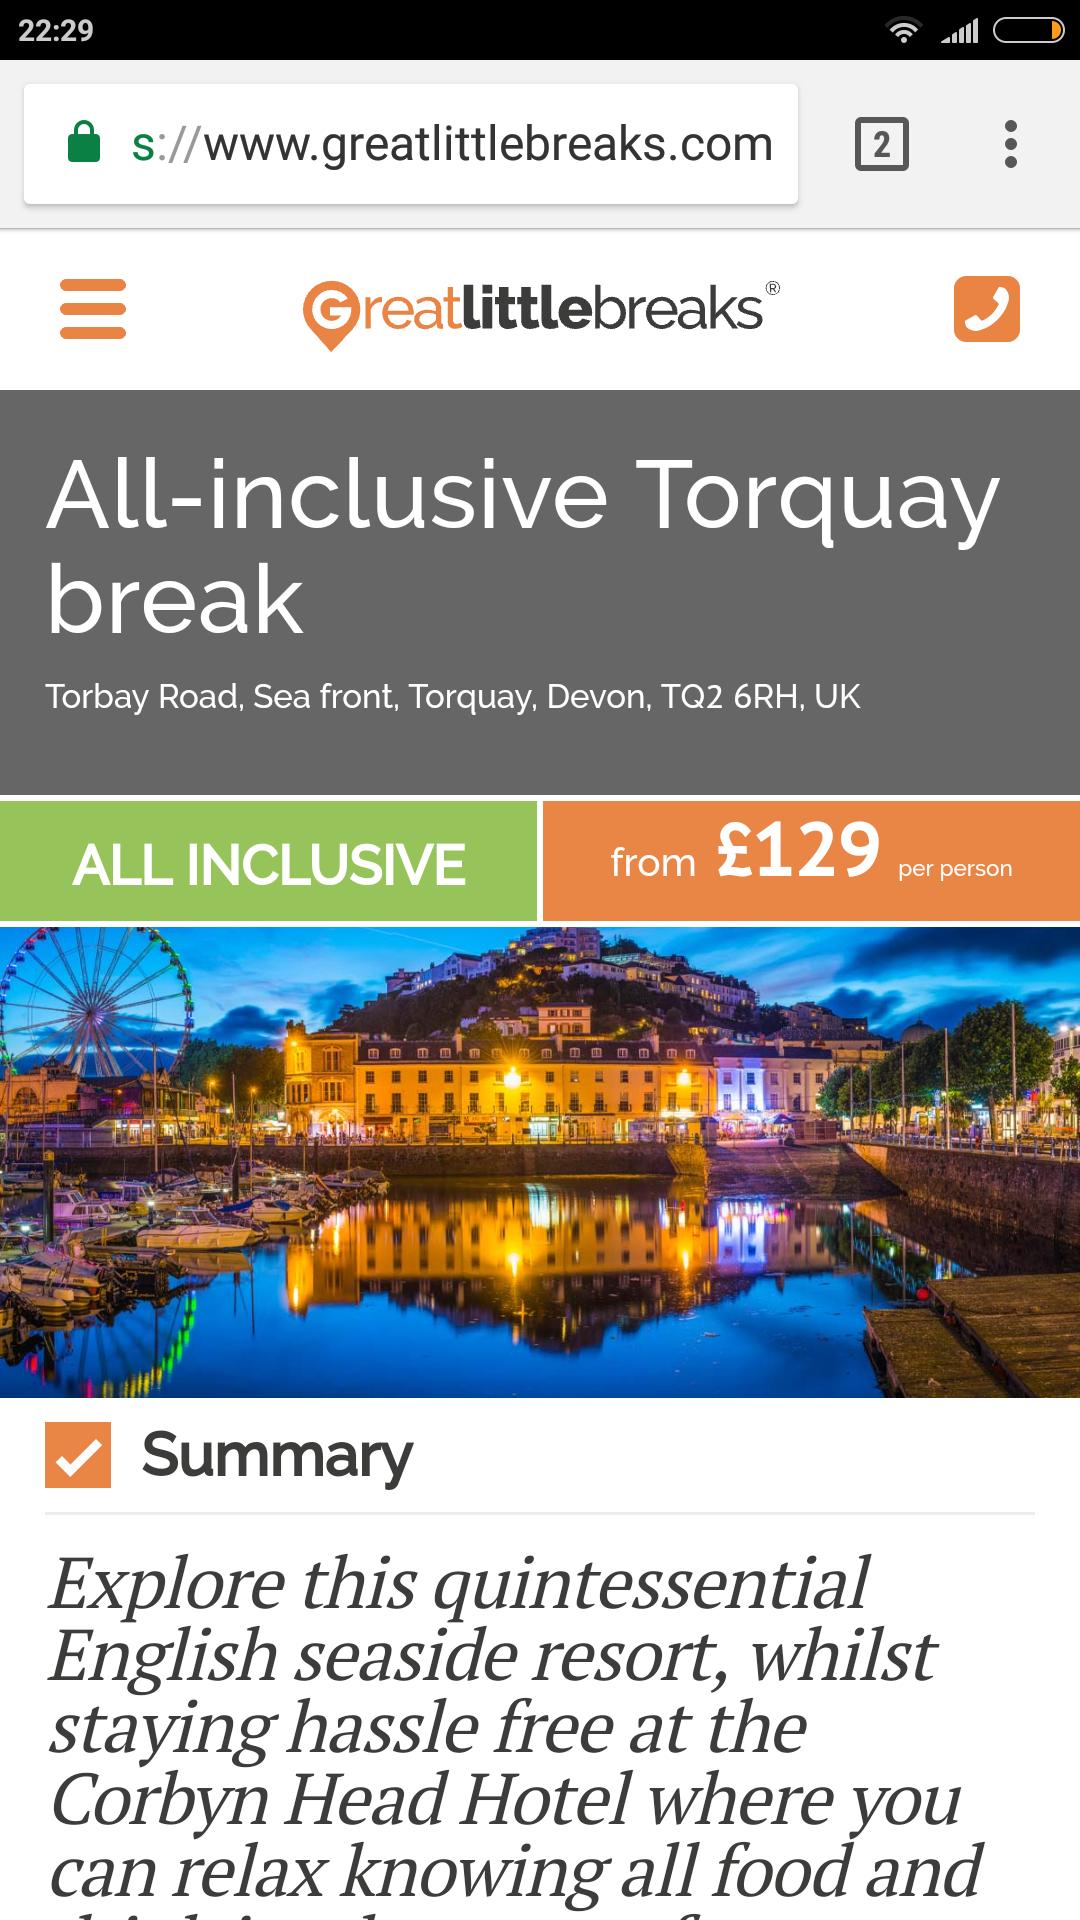 Two Night All Inclusive UK Breaks (Inc weekend dates) from £109pp (£218pp for 2) @ Great Little Breaks